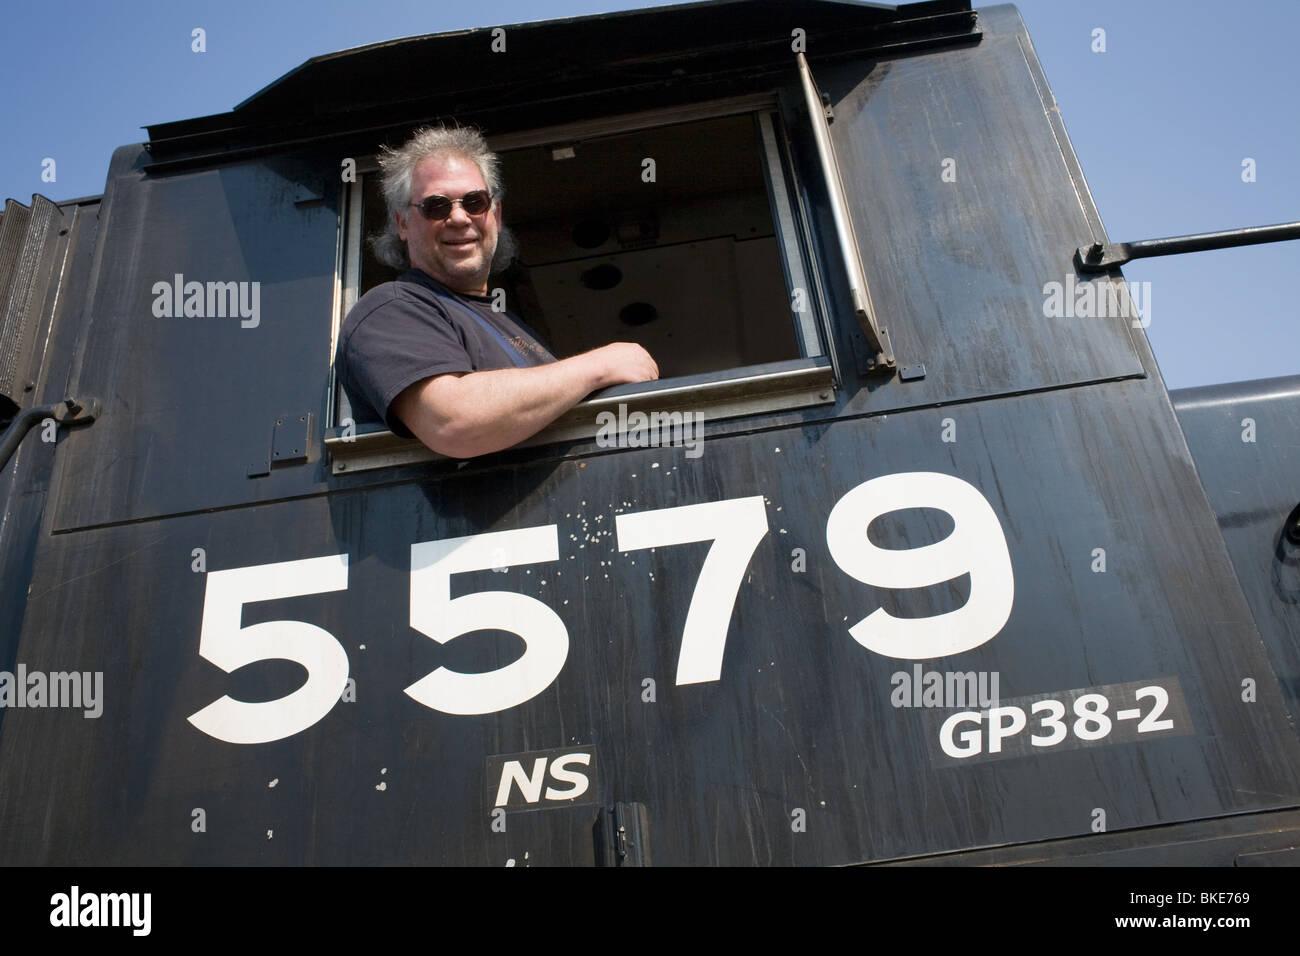 CSX locomotive engineer aka engineman, Hagerstown, Maryland - Stock Image